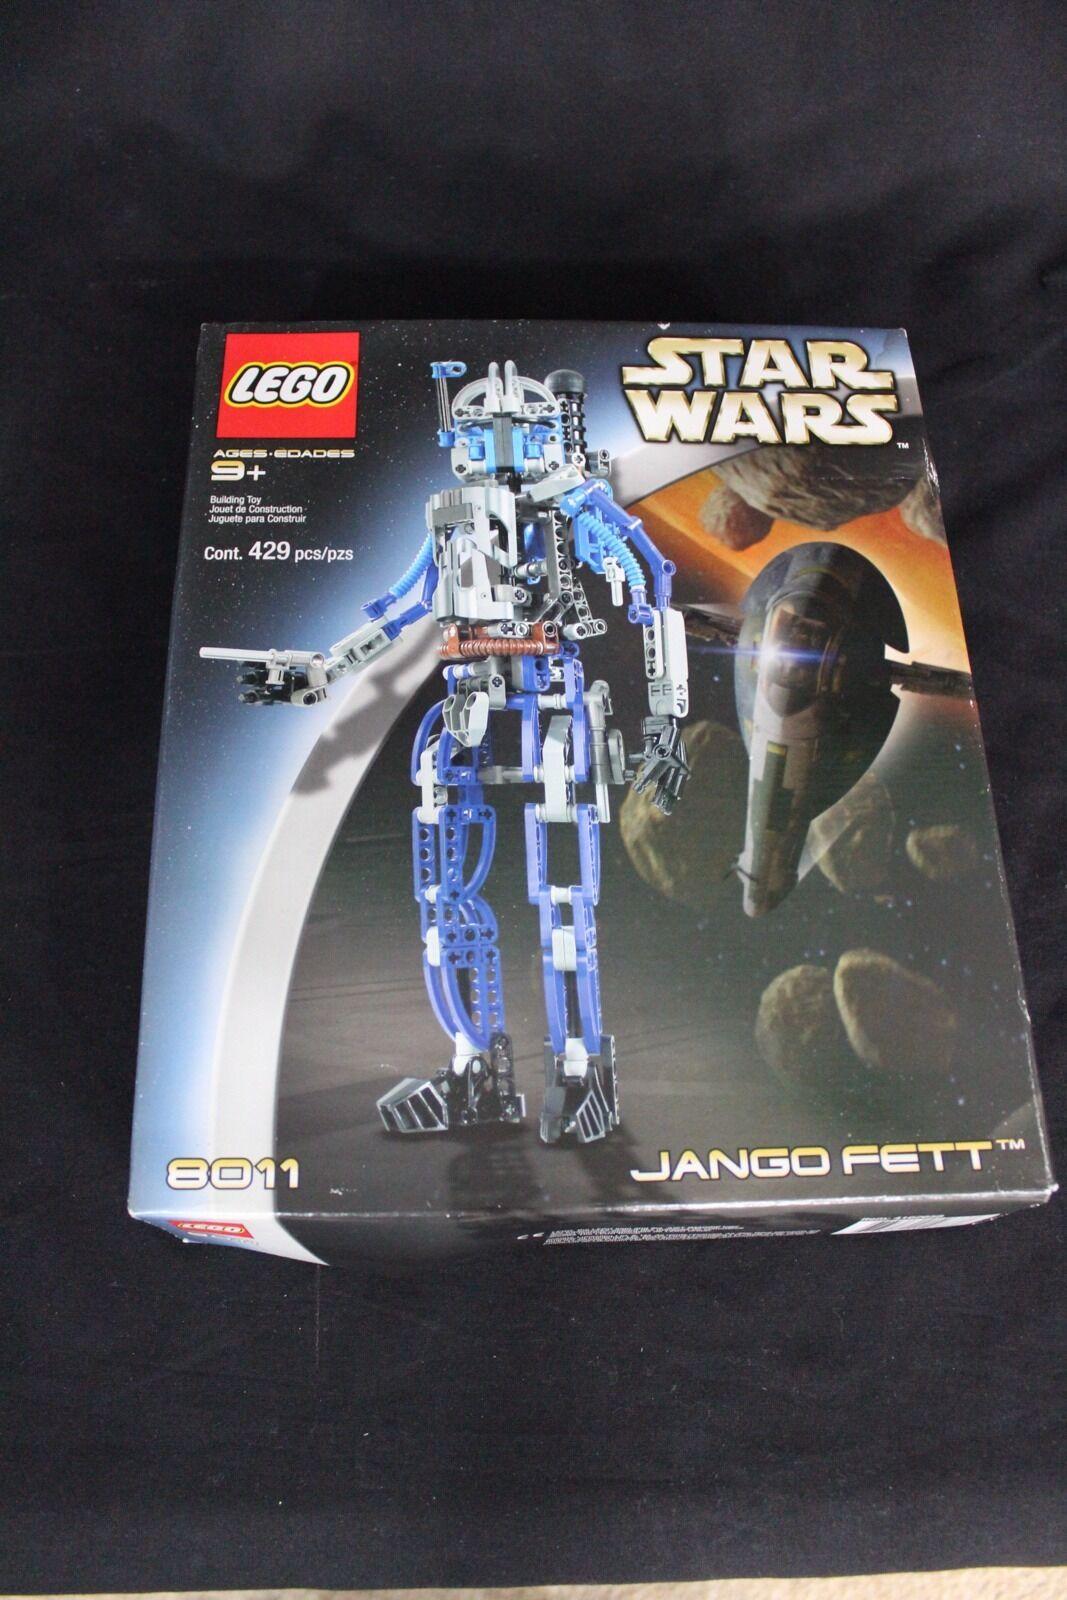 NEW Lego Star Wars Jango Fett    8011. 429 pcs+box+instruction book. Nuovo Set